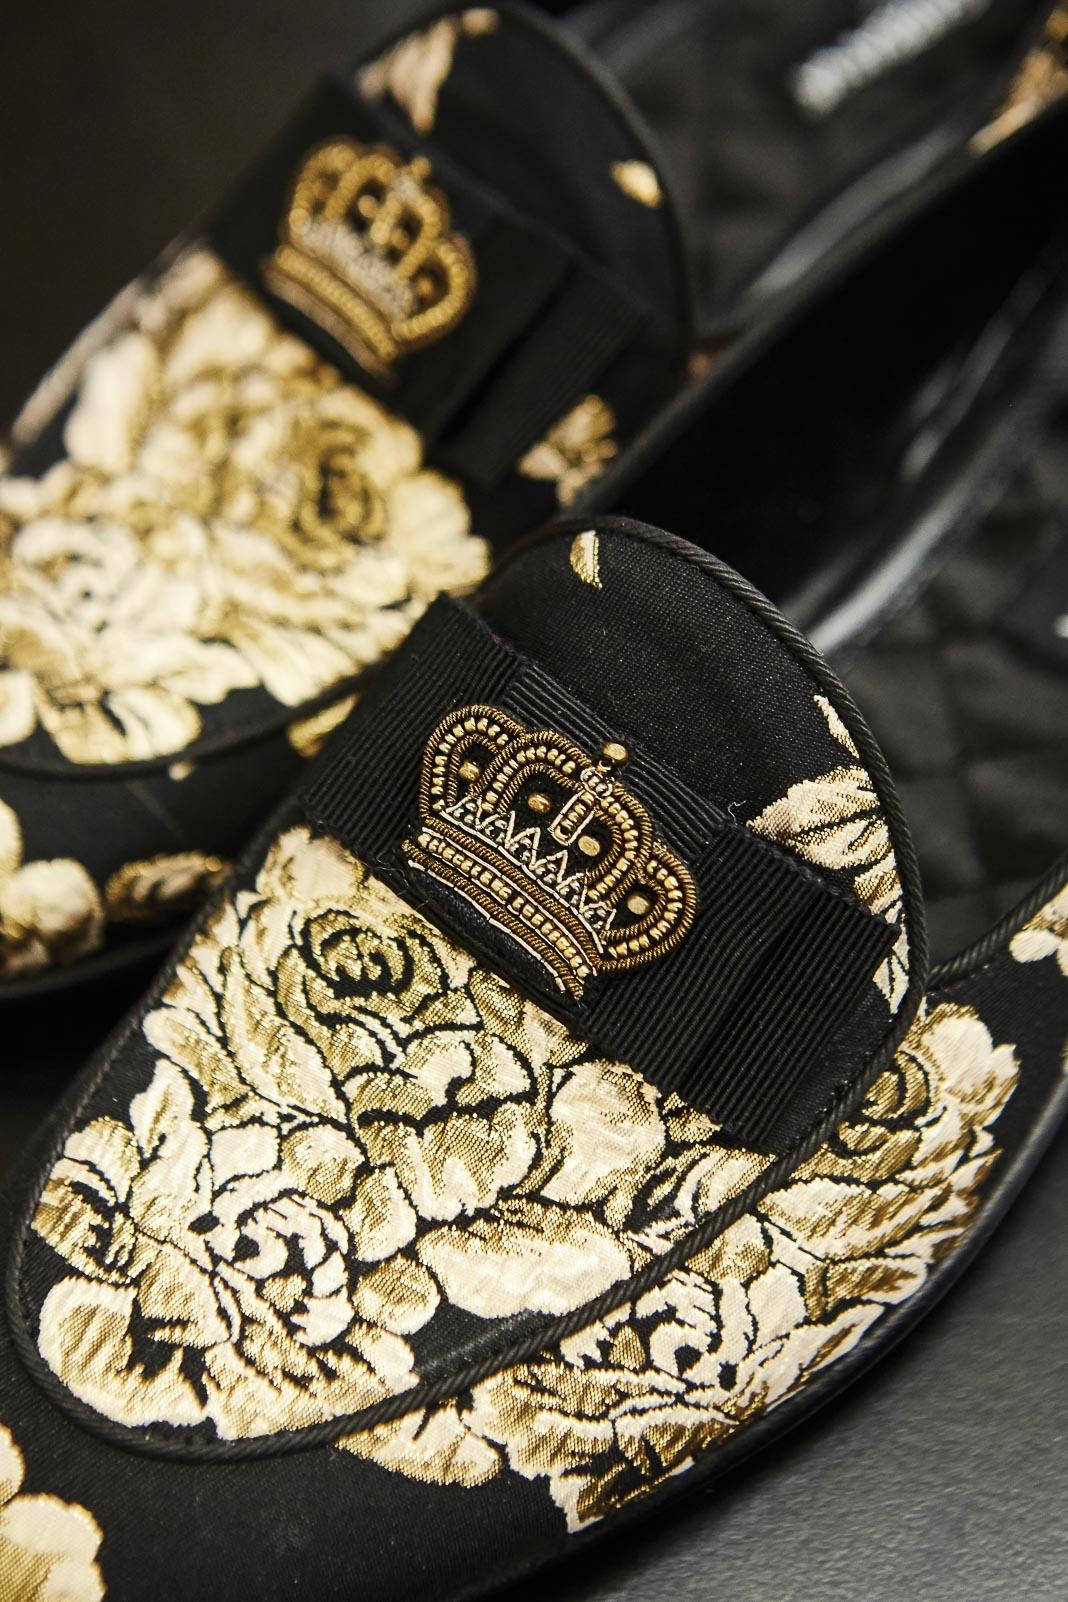 bo-suu-tap-mua-thu-dong-2018-2019-cua-Dolce-Gabbana-4